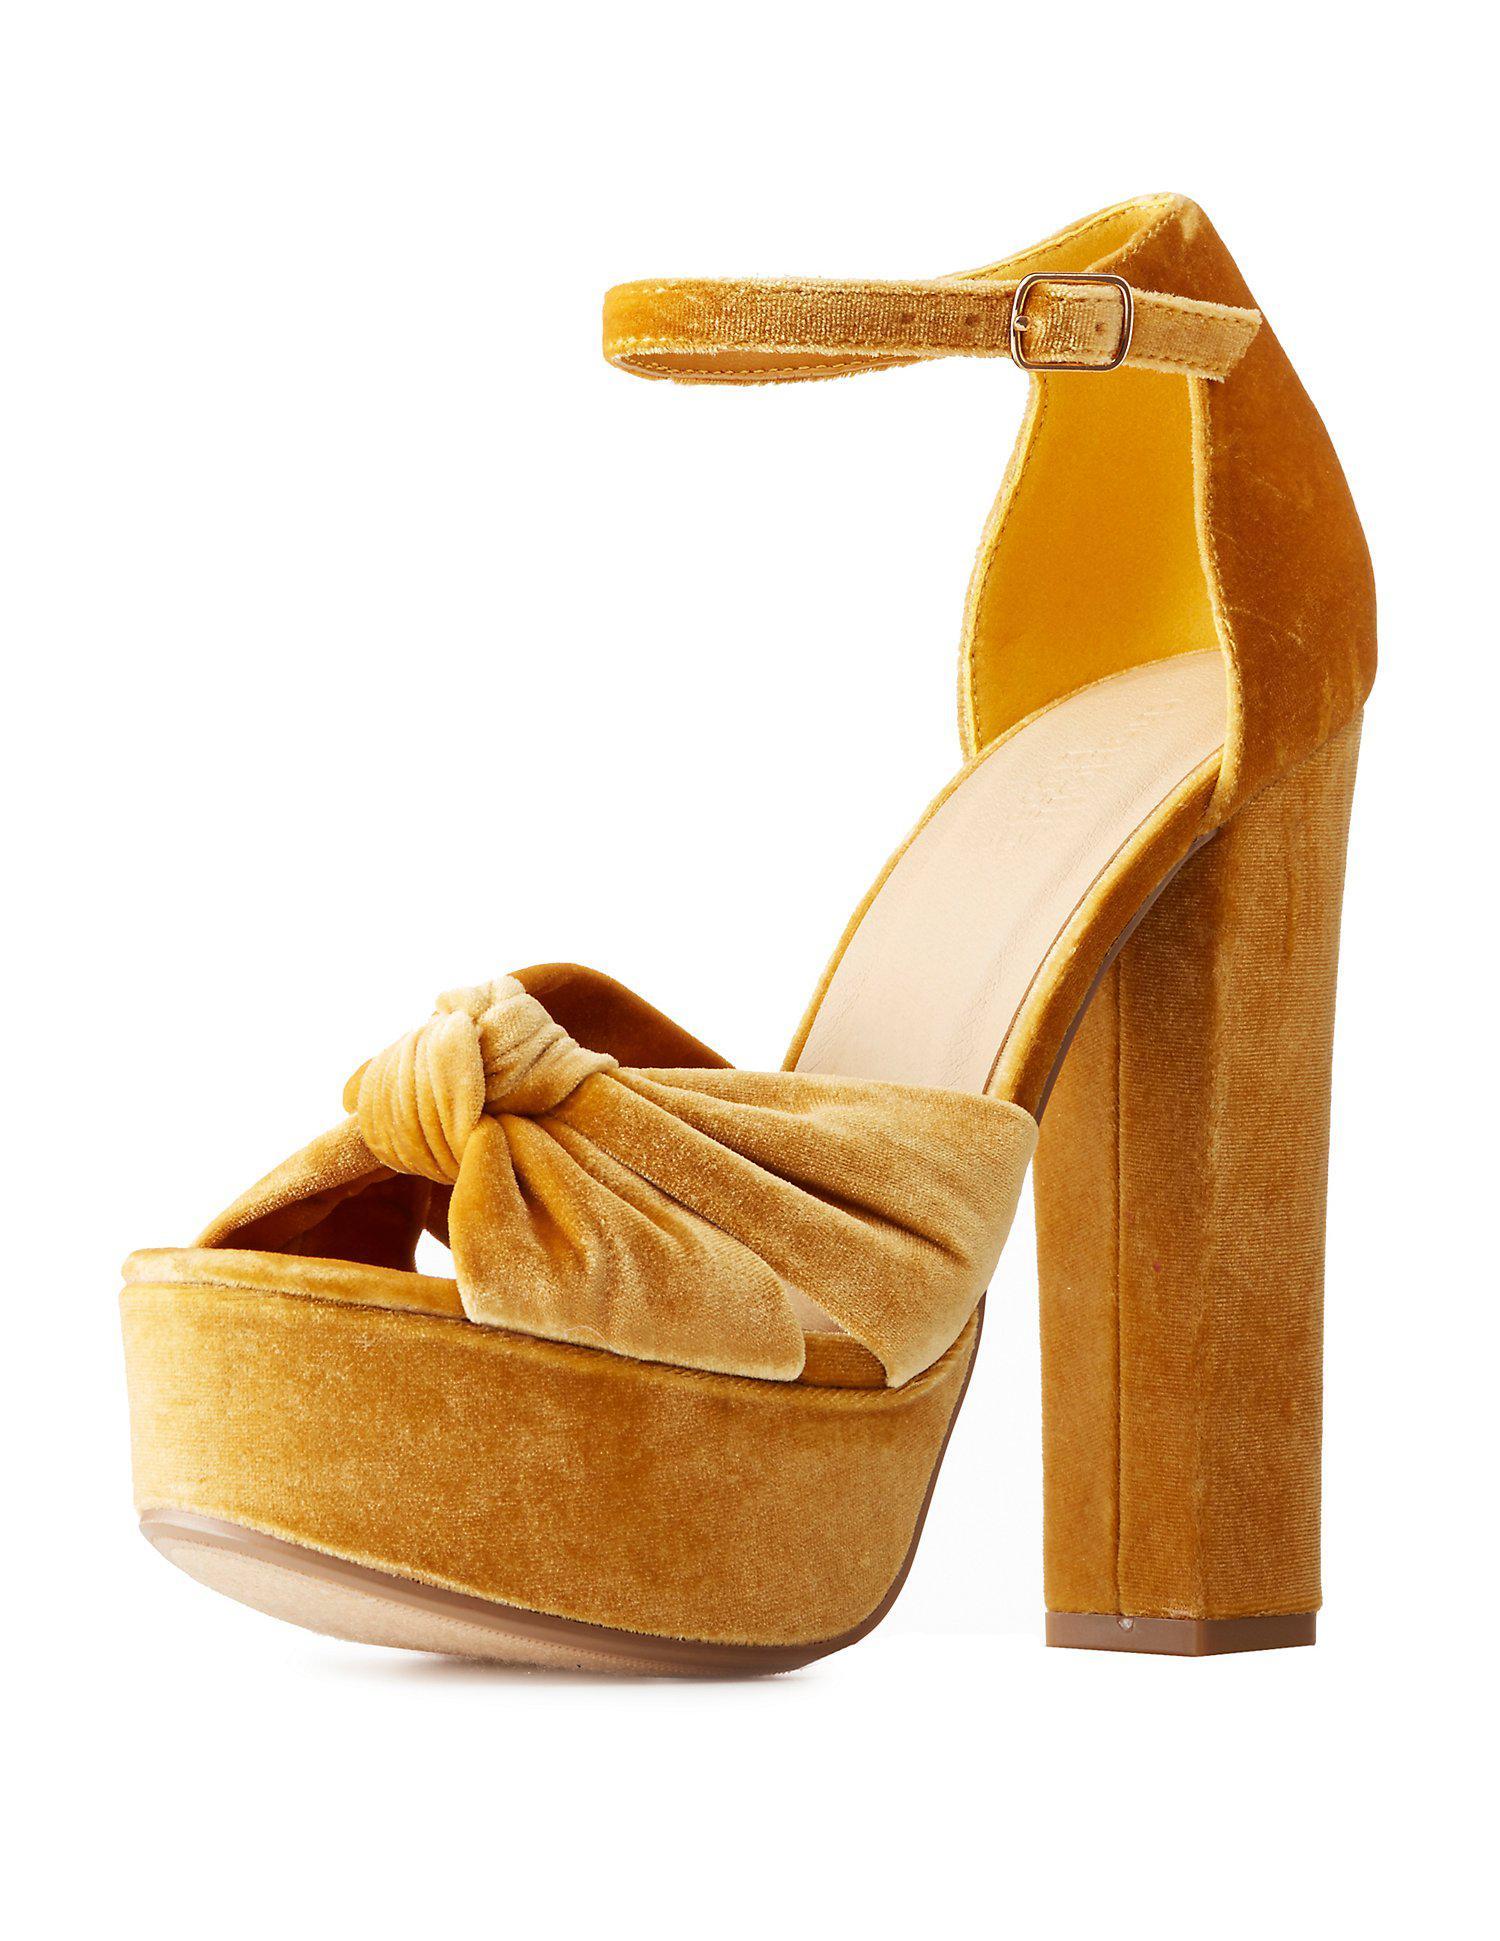 4c723f0e8241 Lyst - Charlotte Russe Velvet Two-piece Platform Sandals